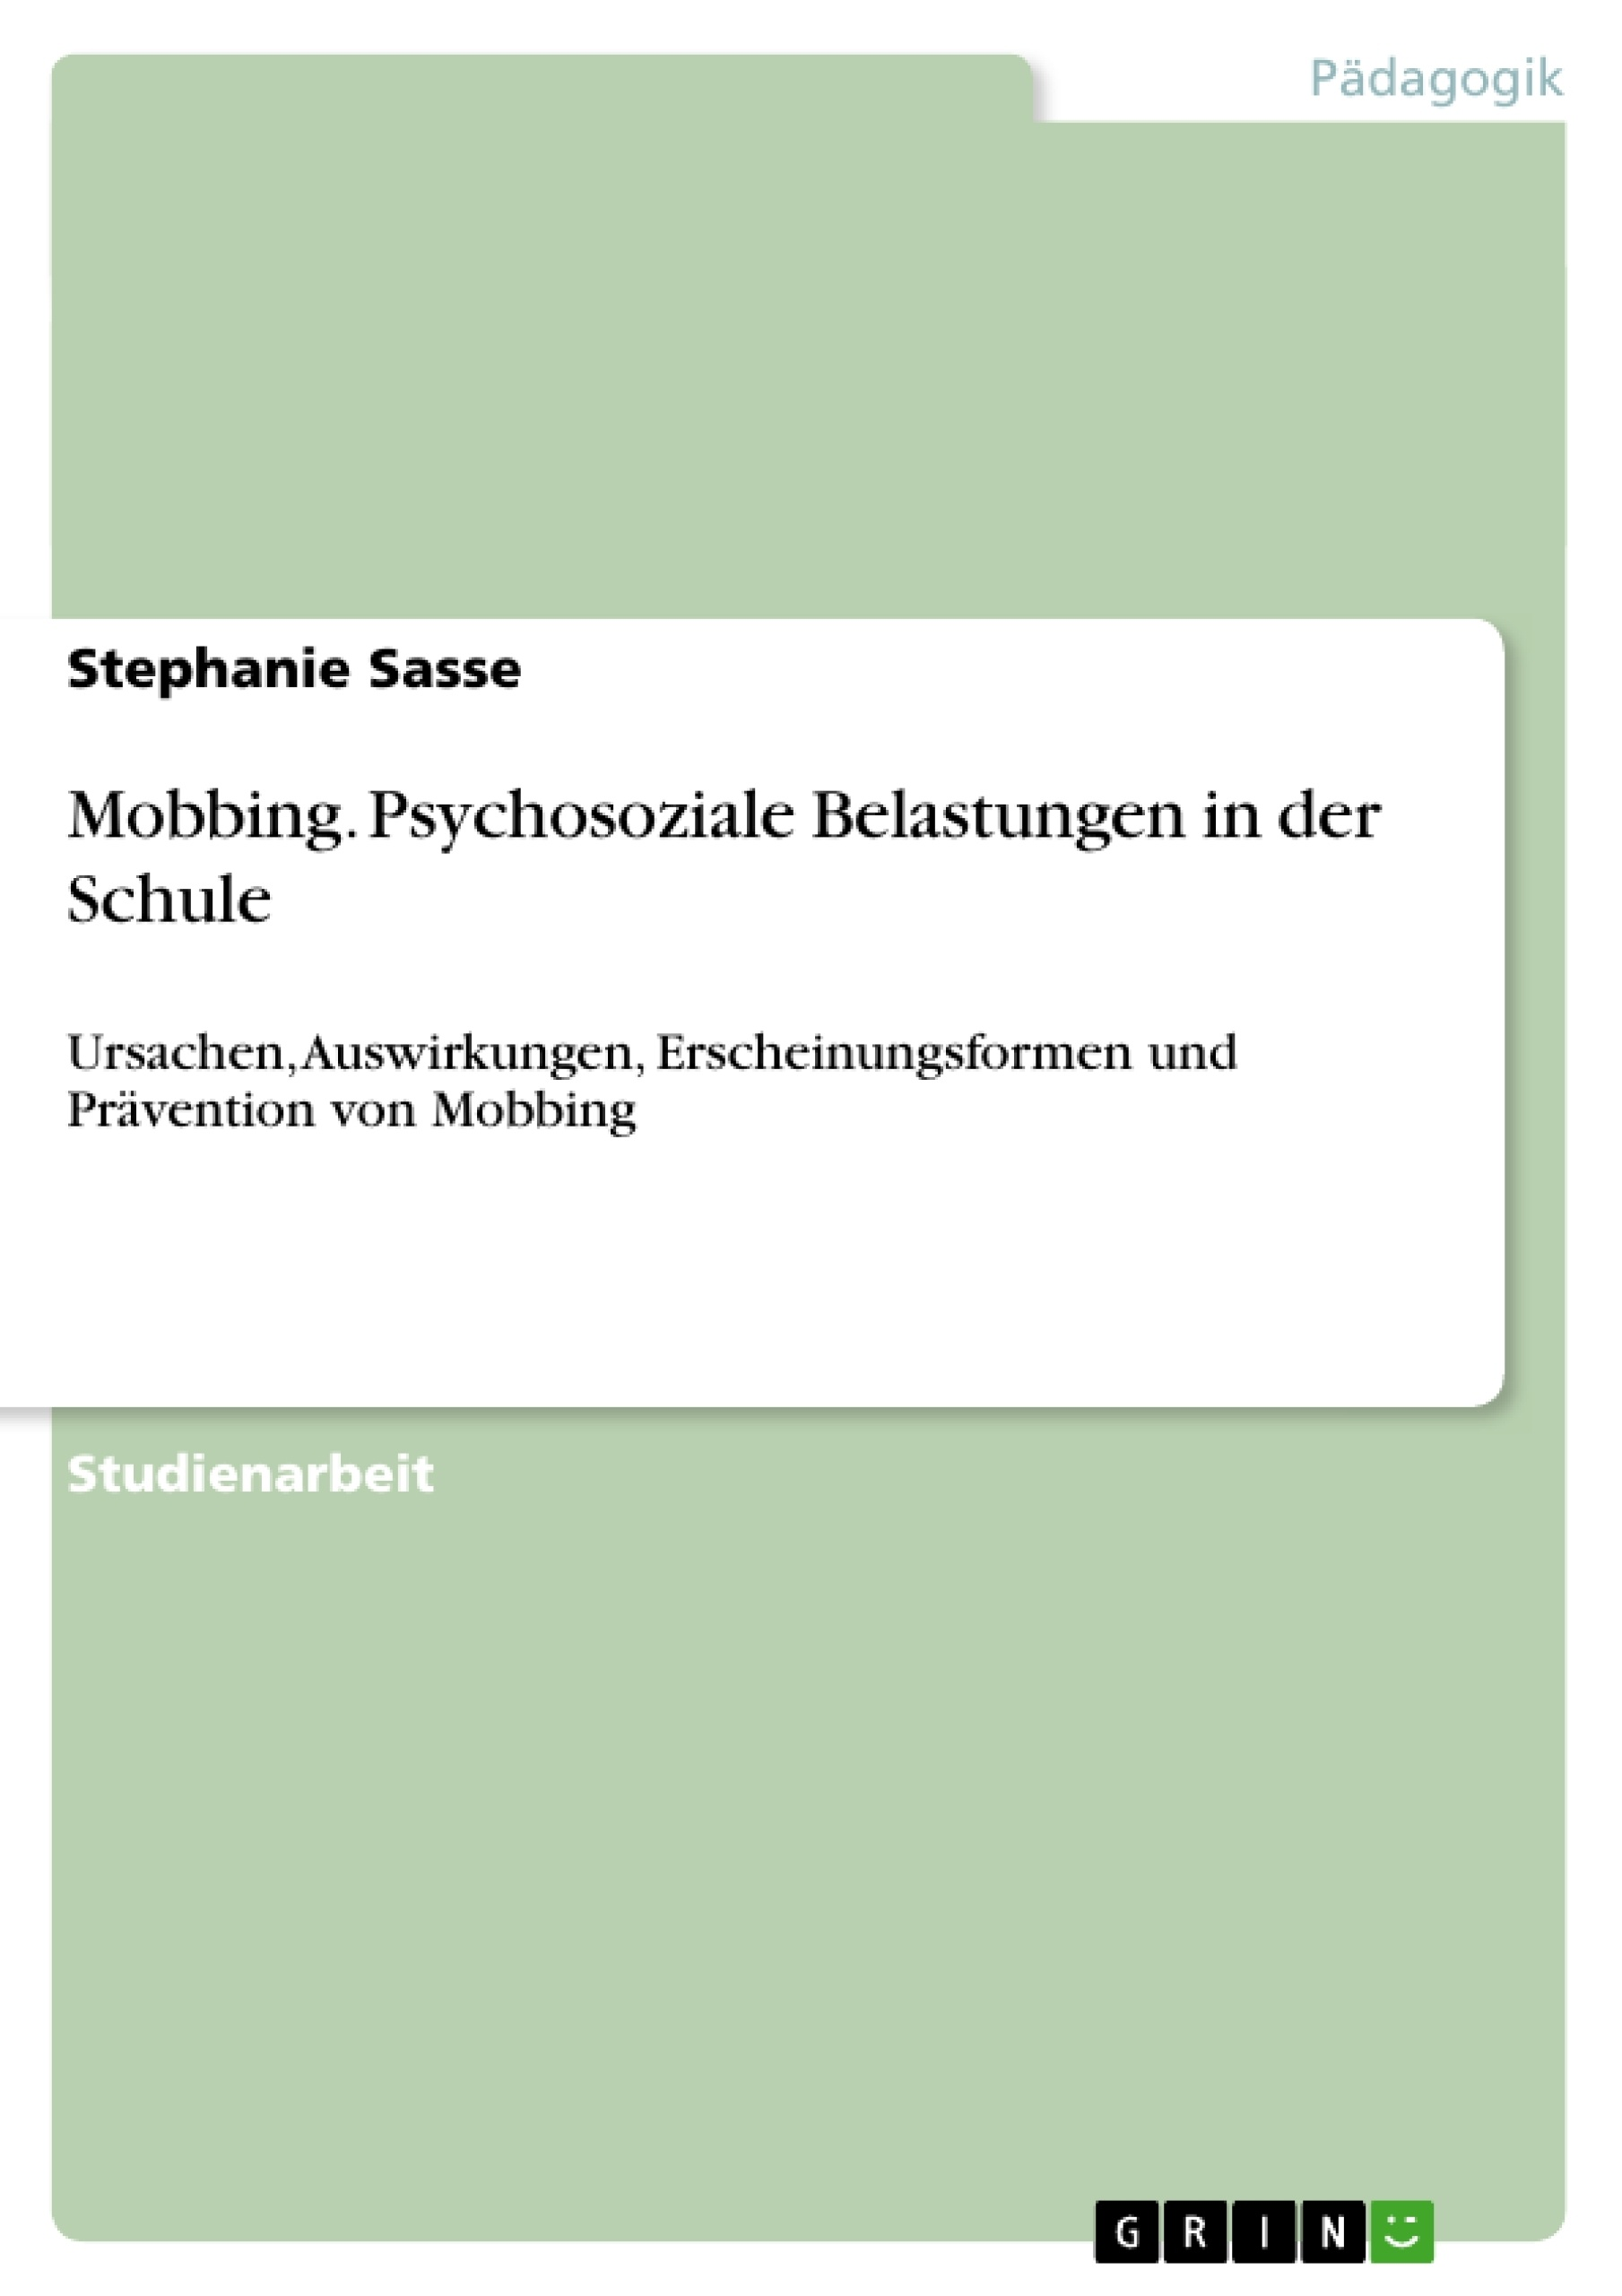 Titel: Mobbing. Psychosoziale Belastungen in der Schule